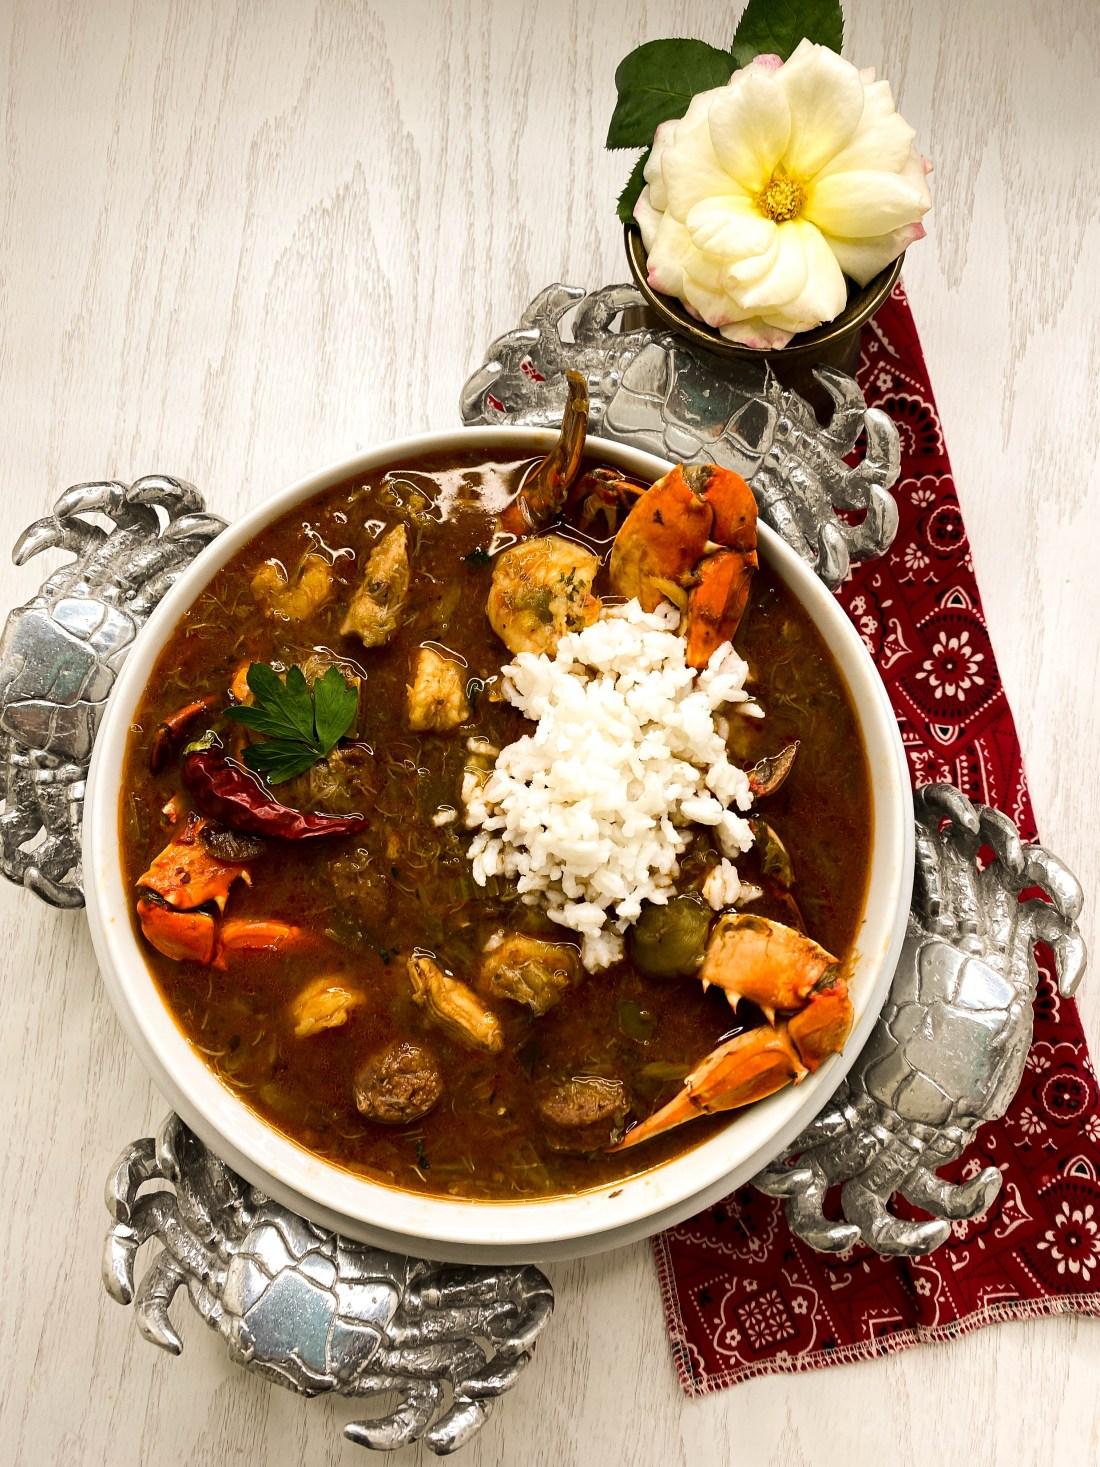 Grain & Gluten Free Creole Gumbo With Rice